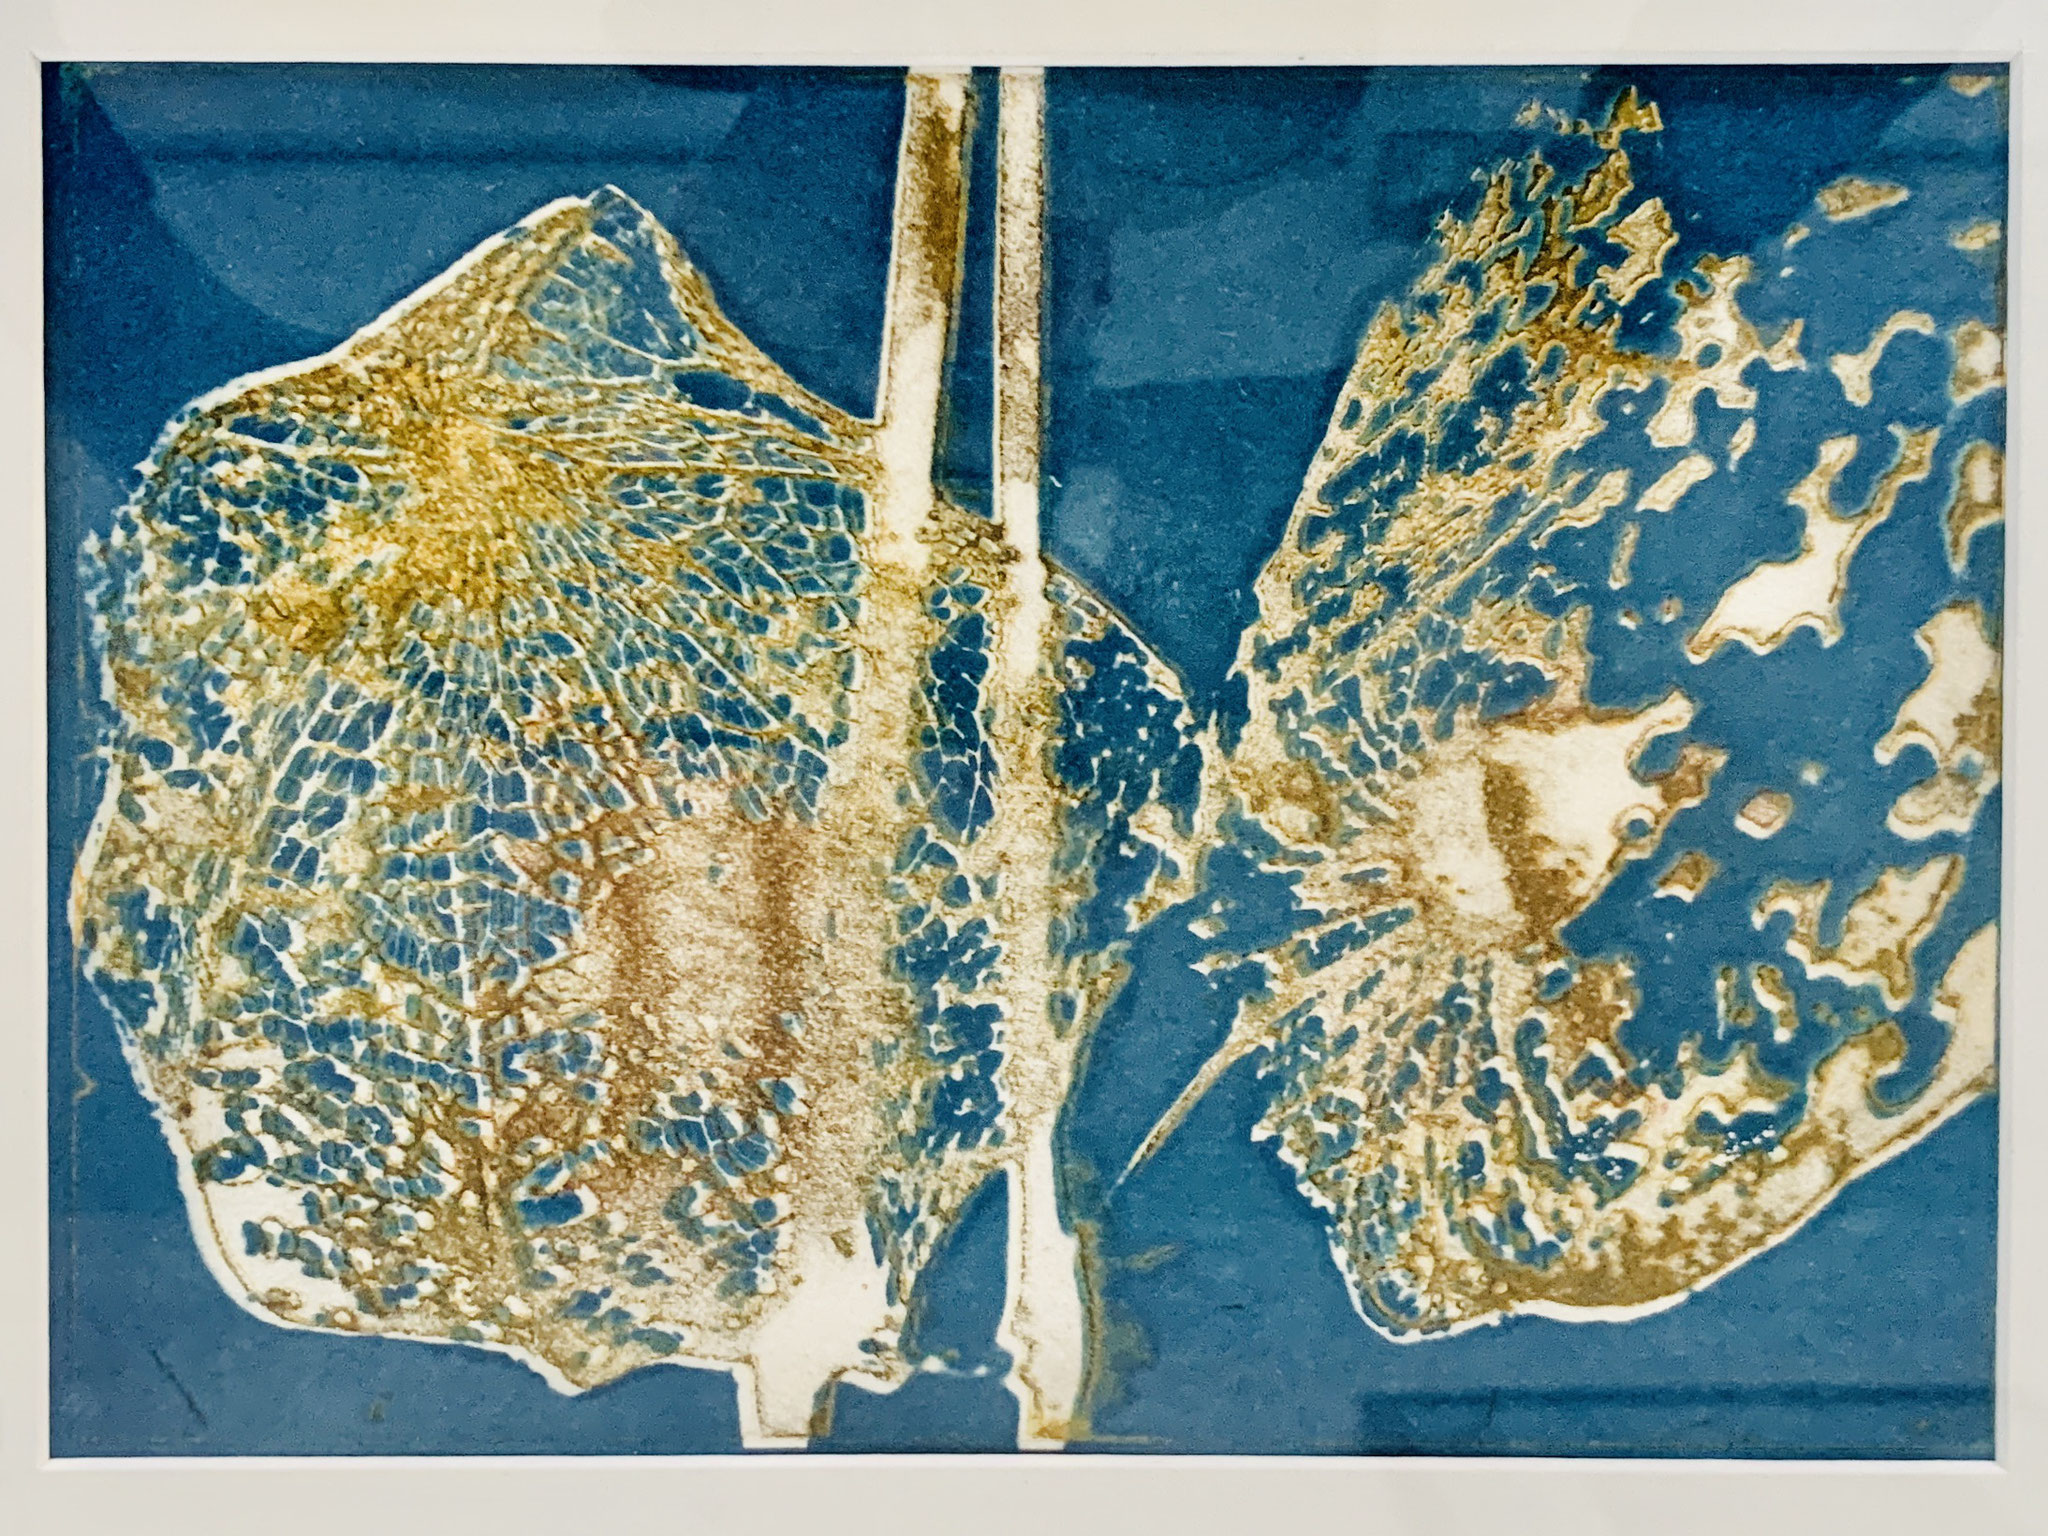 52. Sabina Potthoff, Physalis II, Intagliotypie auf Bütten-Kupferdruckkarton, 390 x 280 mm, 2018/2020, 250 €